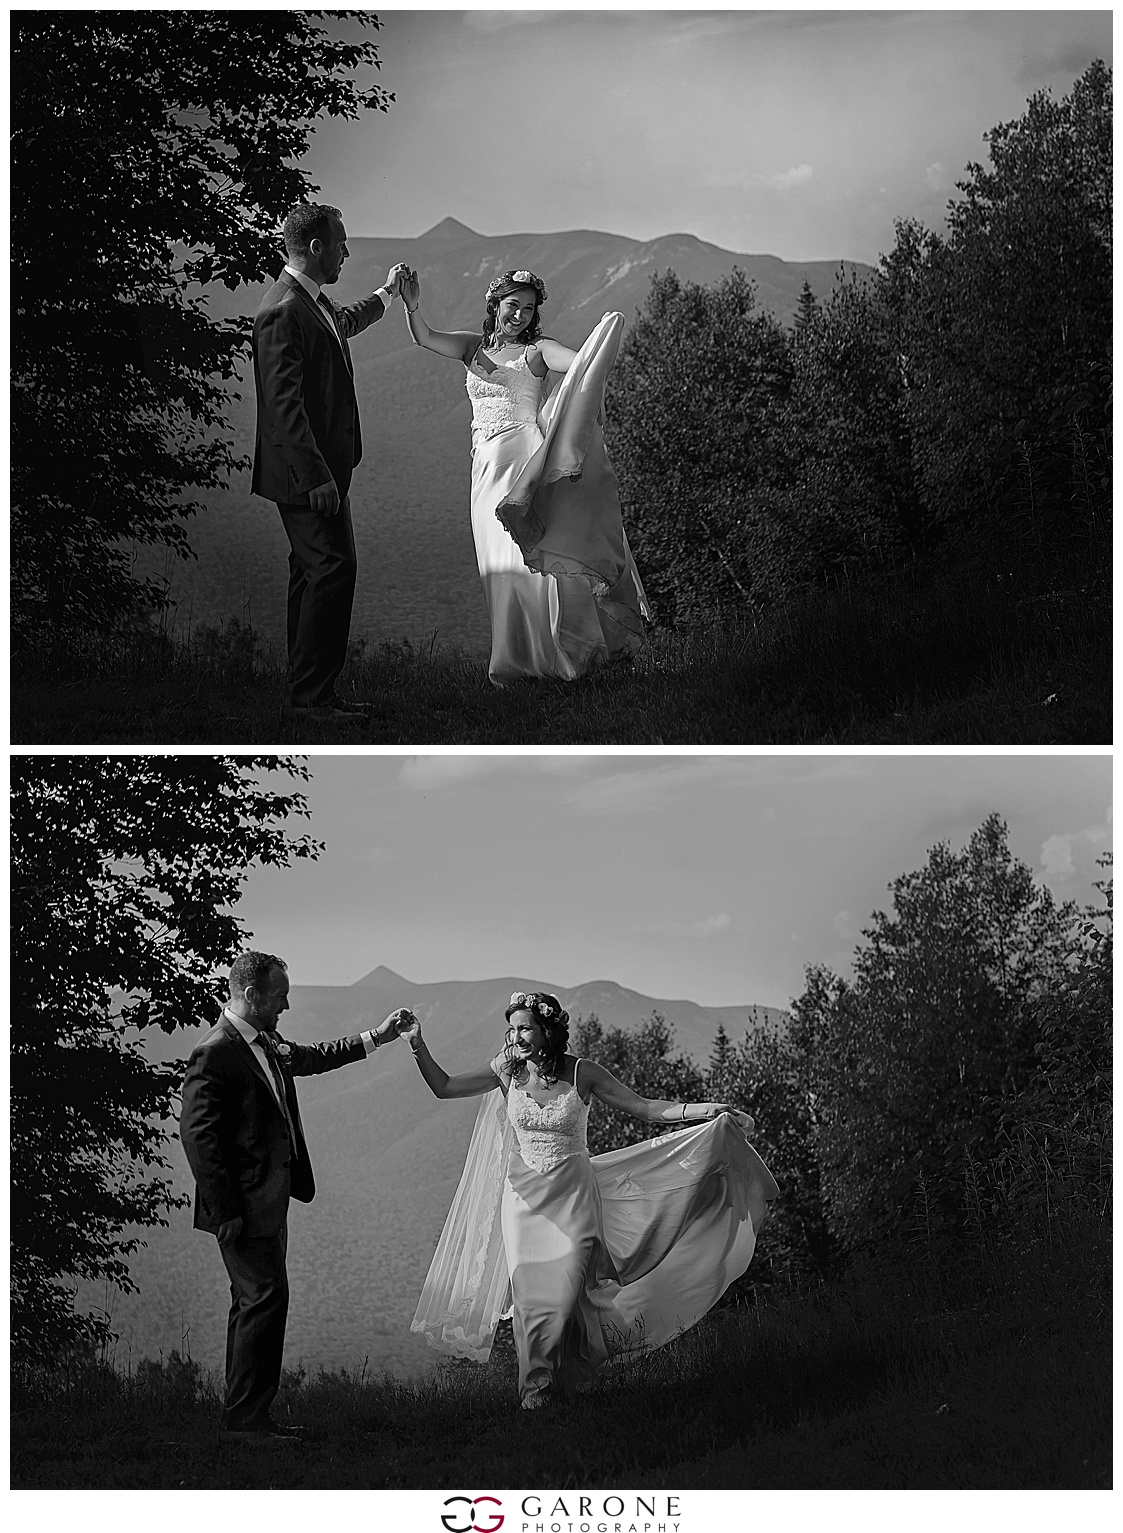 Natalie_Eric_Loon_Wedding_White_Mountain_Wedding_Photography_Garone_Photography_0032.jpg